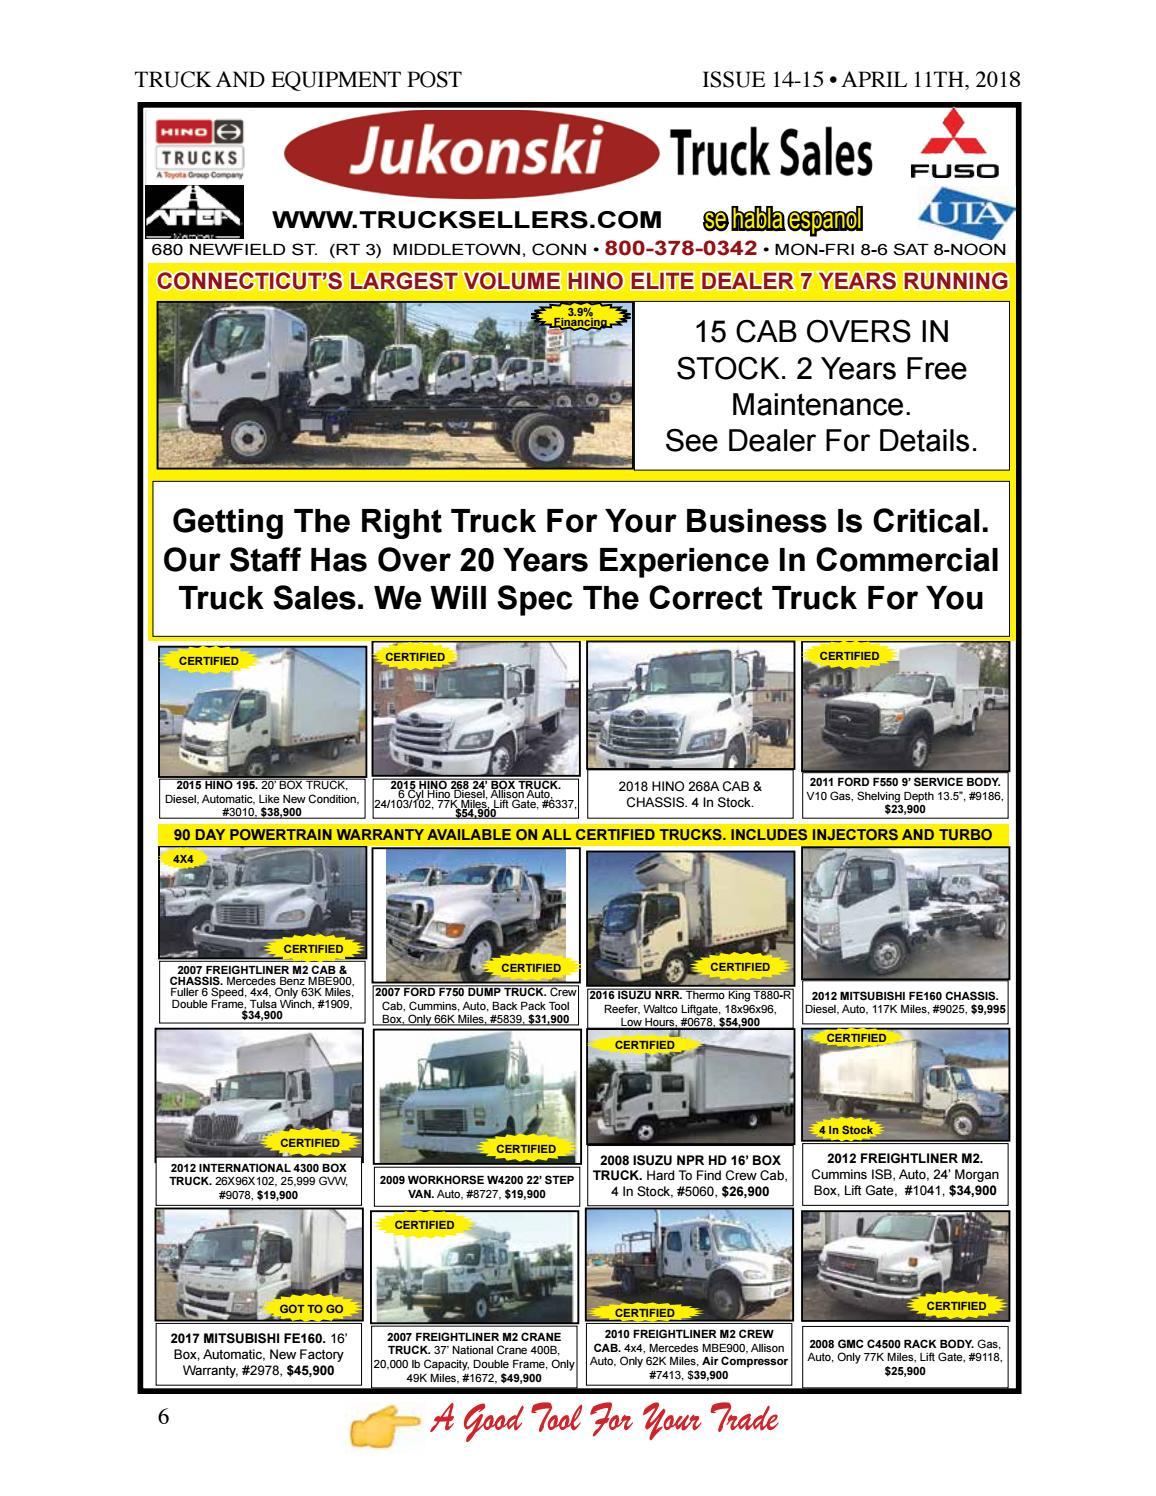 Truck equipment post 14 15 2018 by 1ClickAway - issuu